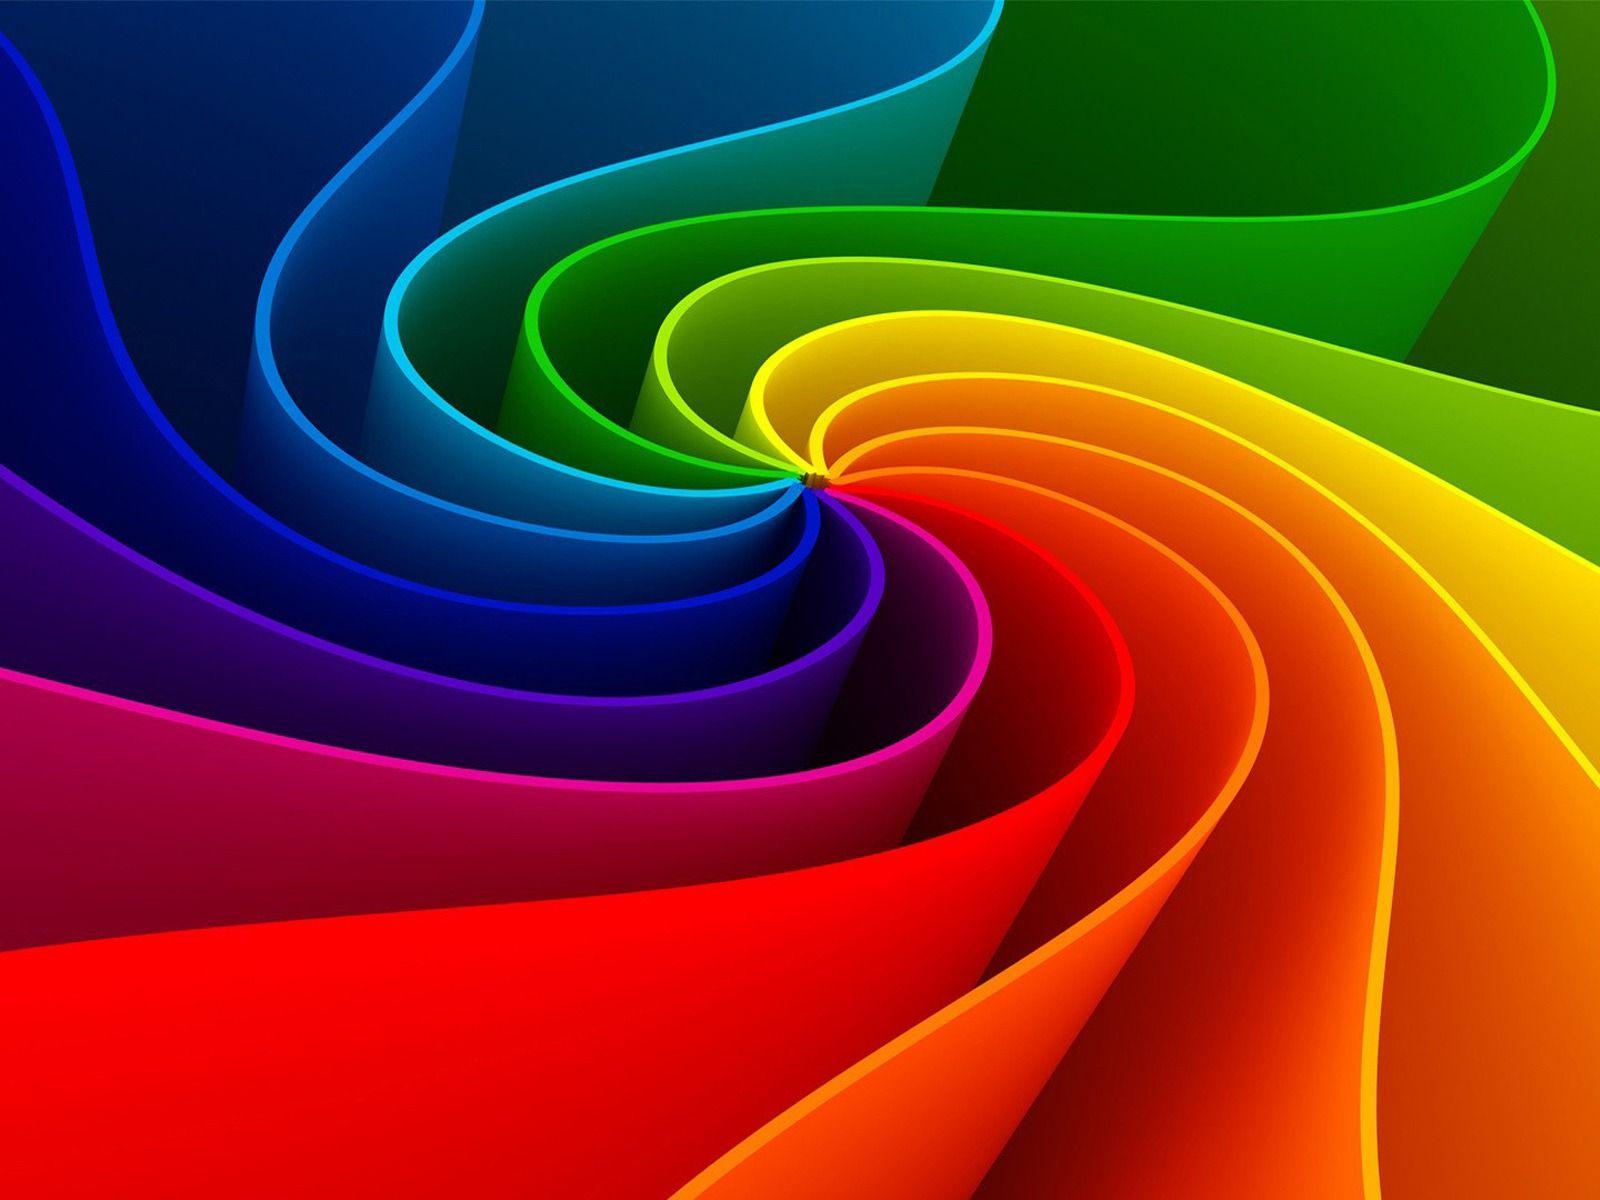 3d Rainbow Wallpaper Picture gxk Awesomeness Pinterest